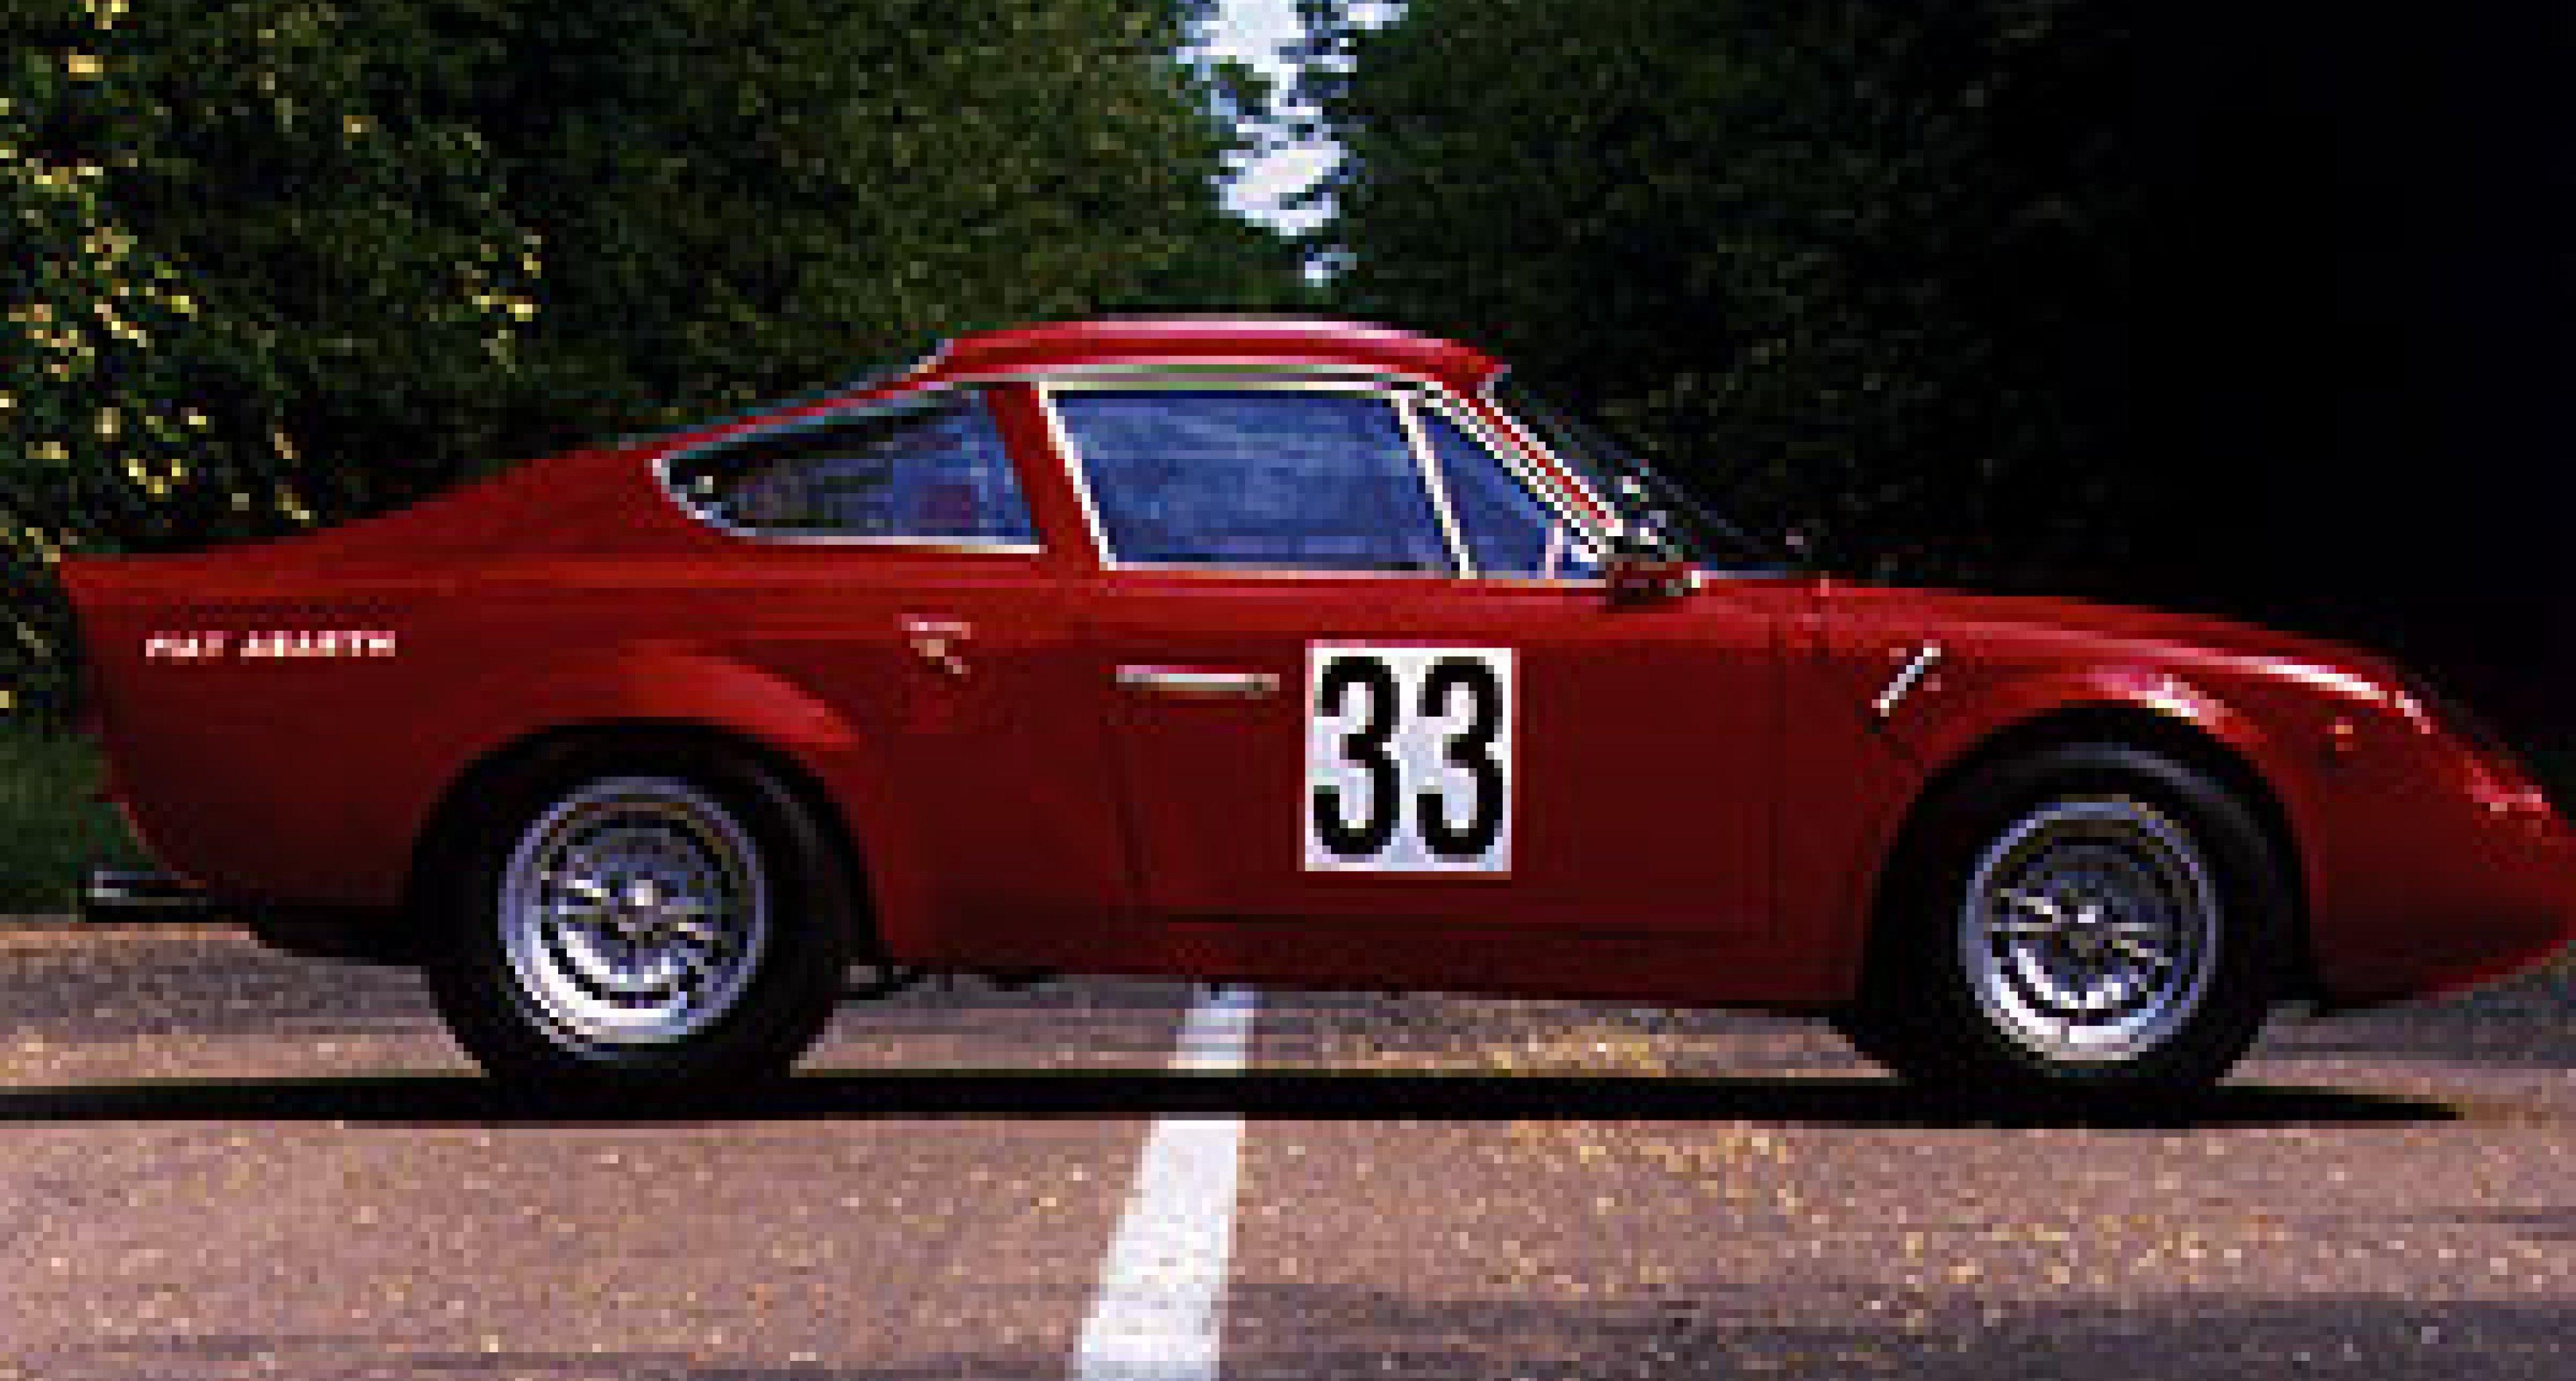 Italian cars and stars at Donington Park - 31st August/1st September